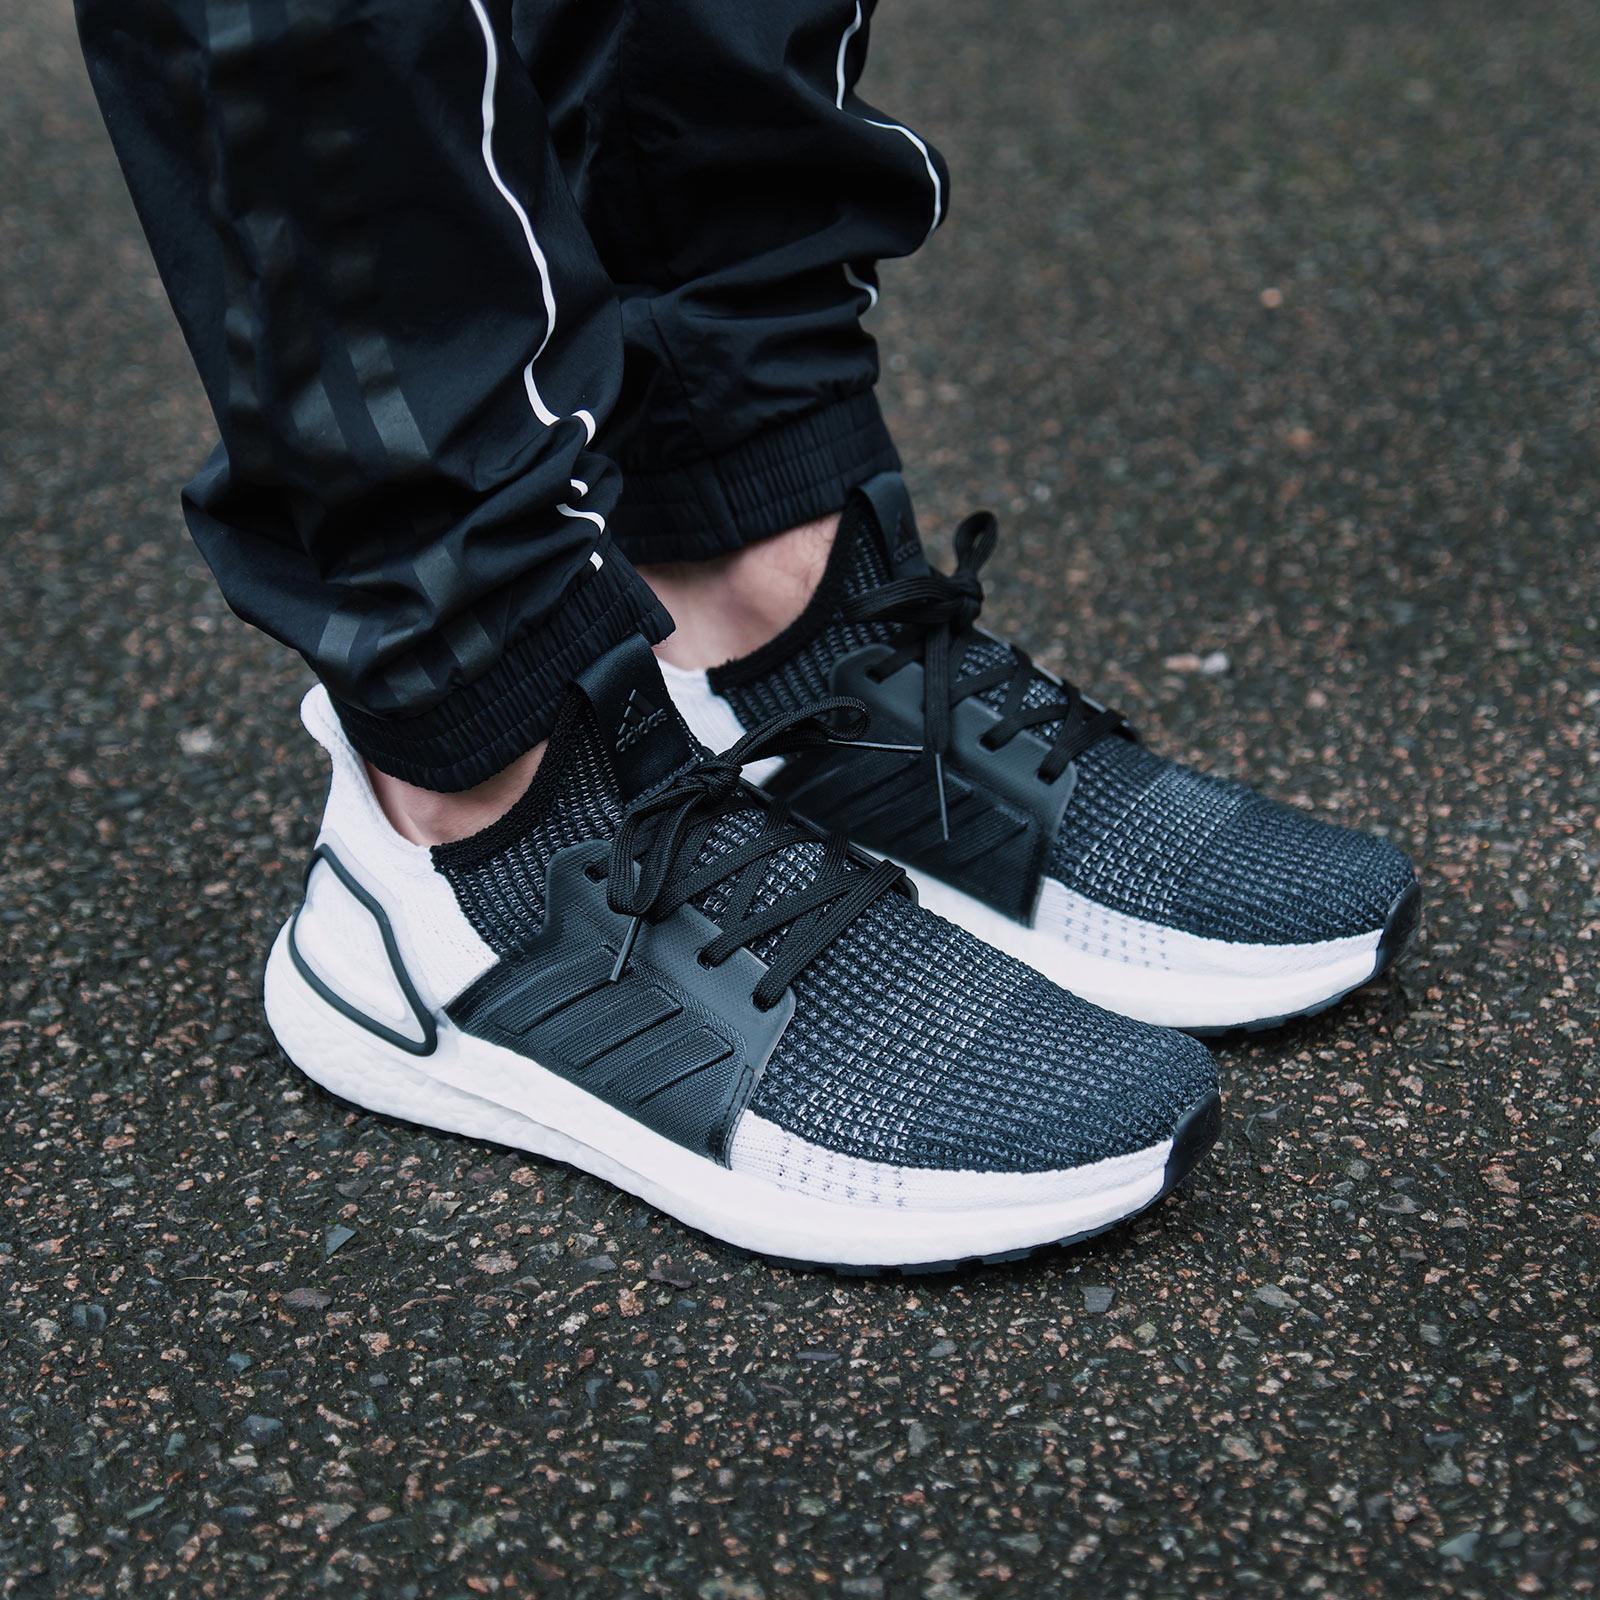 adidas ultra boost streetwear